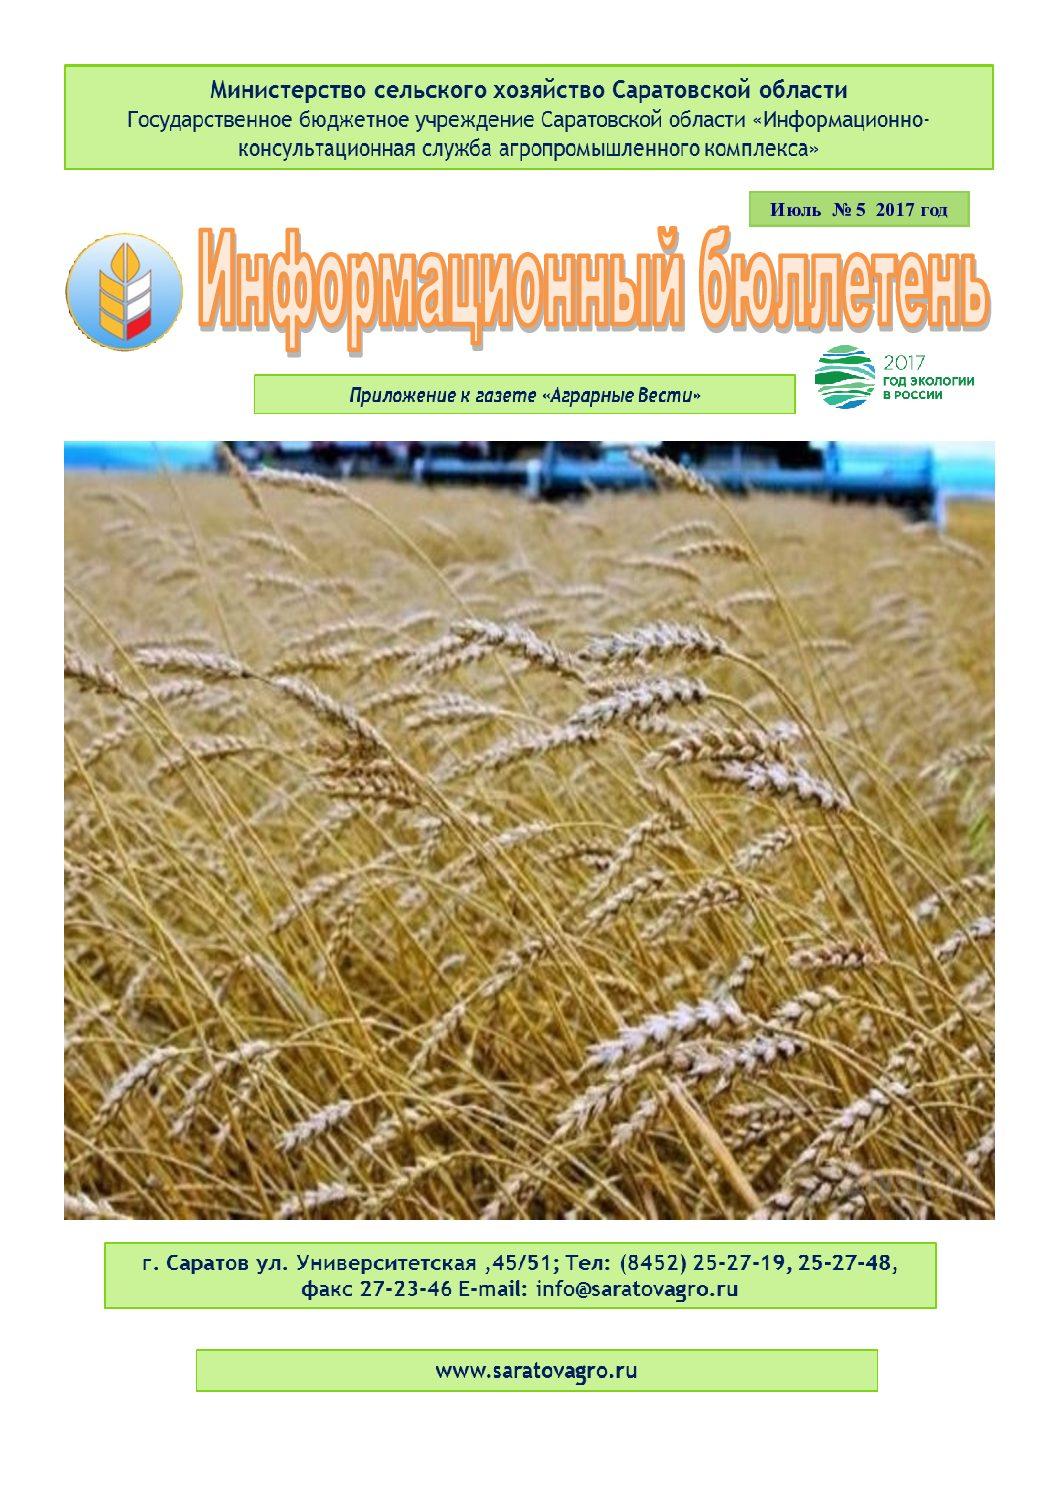 https://saratovagro.ru/wp-content/uploads/2020/08/5.2017-pdf.jpg